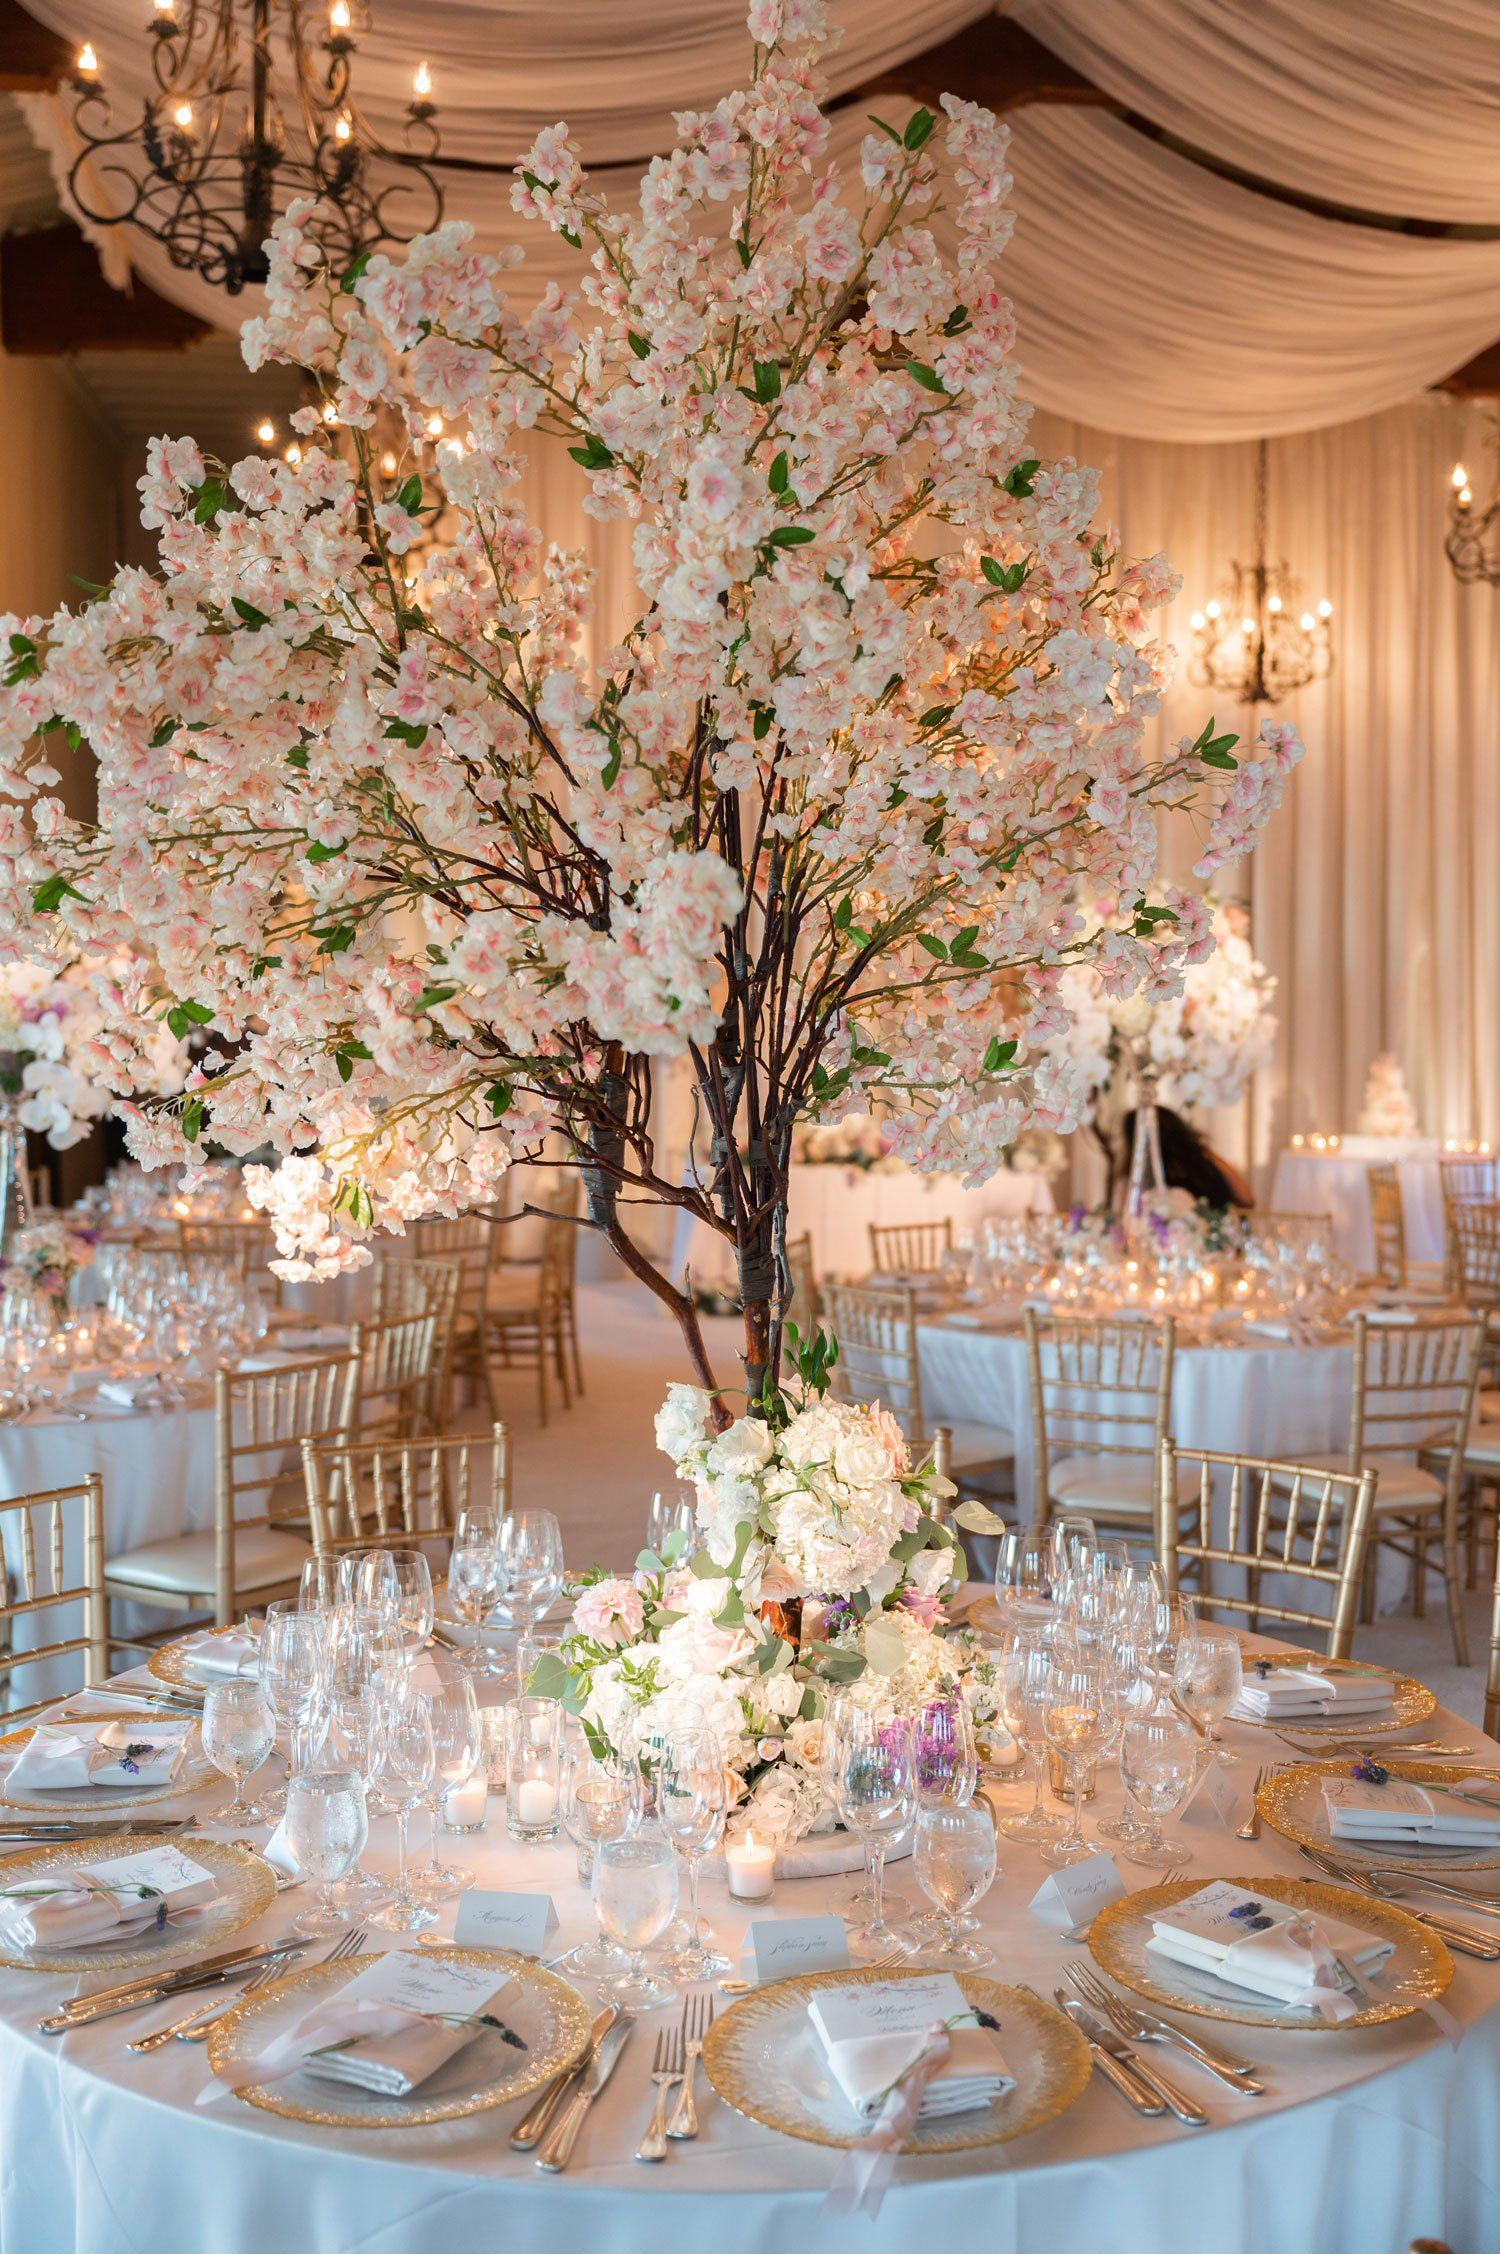 Ocean View Ceremony Elegant Reception With Cherry Blossom Theme Cherry Blossom Centerpiece Flower Centerpieces Wedding Cherry Blossom Theme